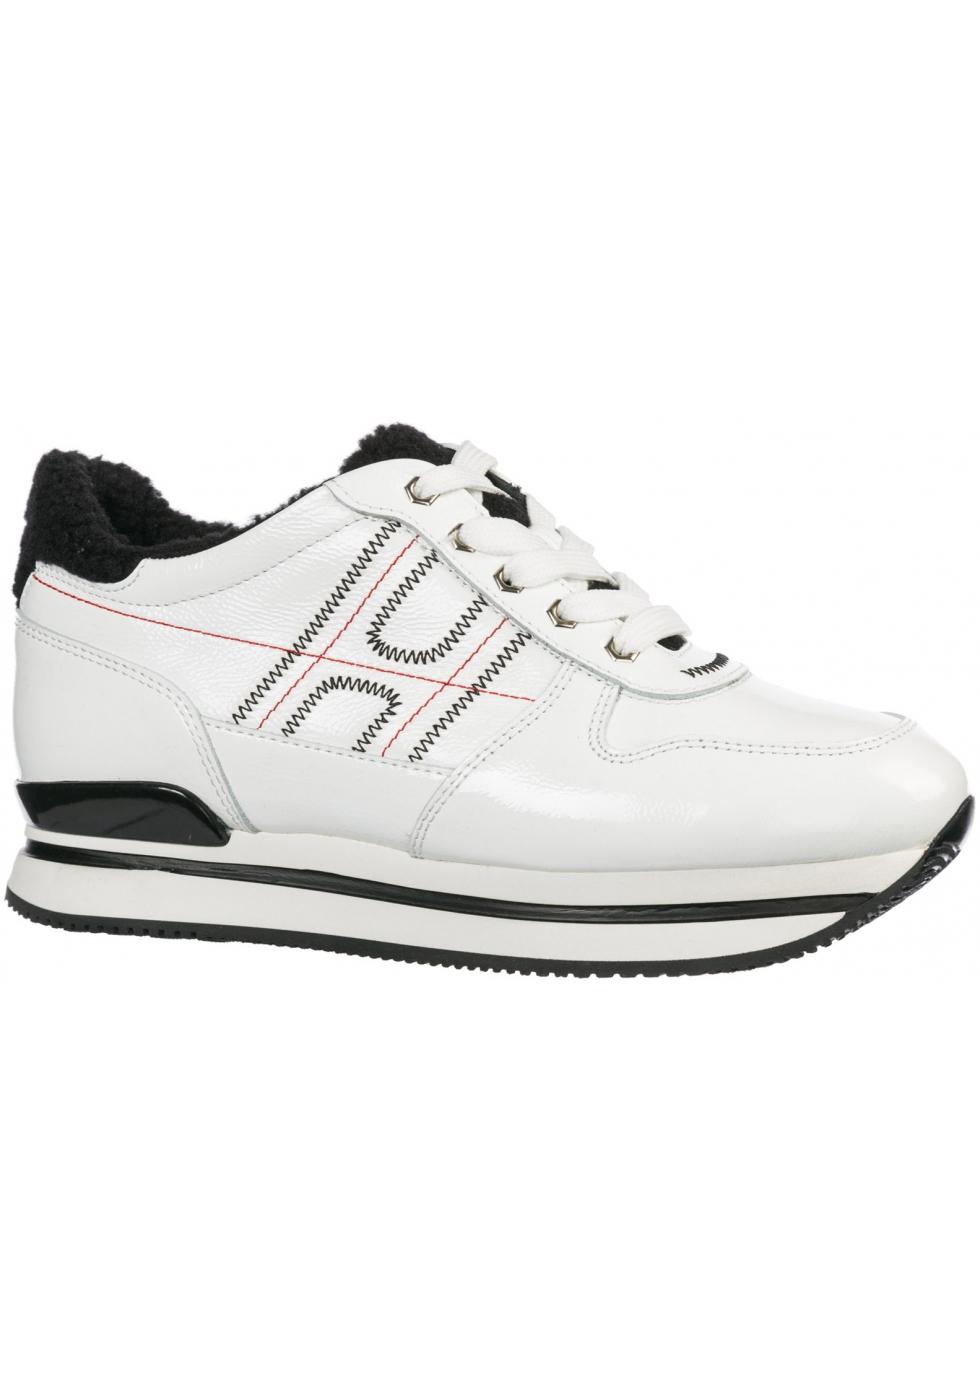 Sneakers donna con zeppa Hogan in pelle bianco - Italian Boutique